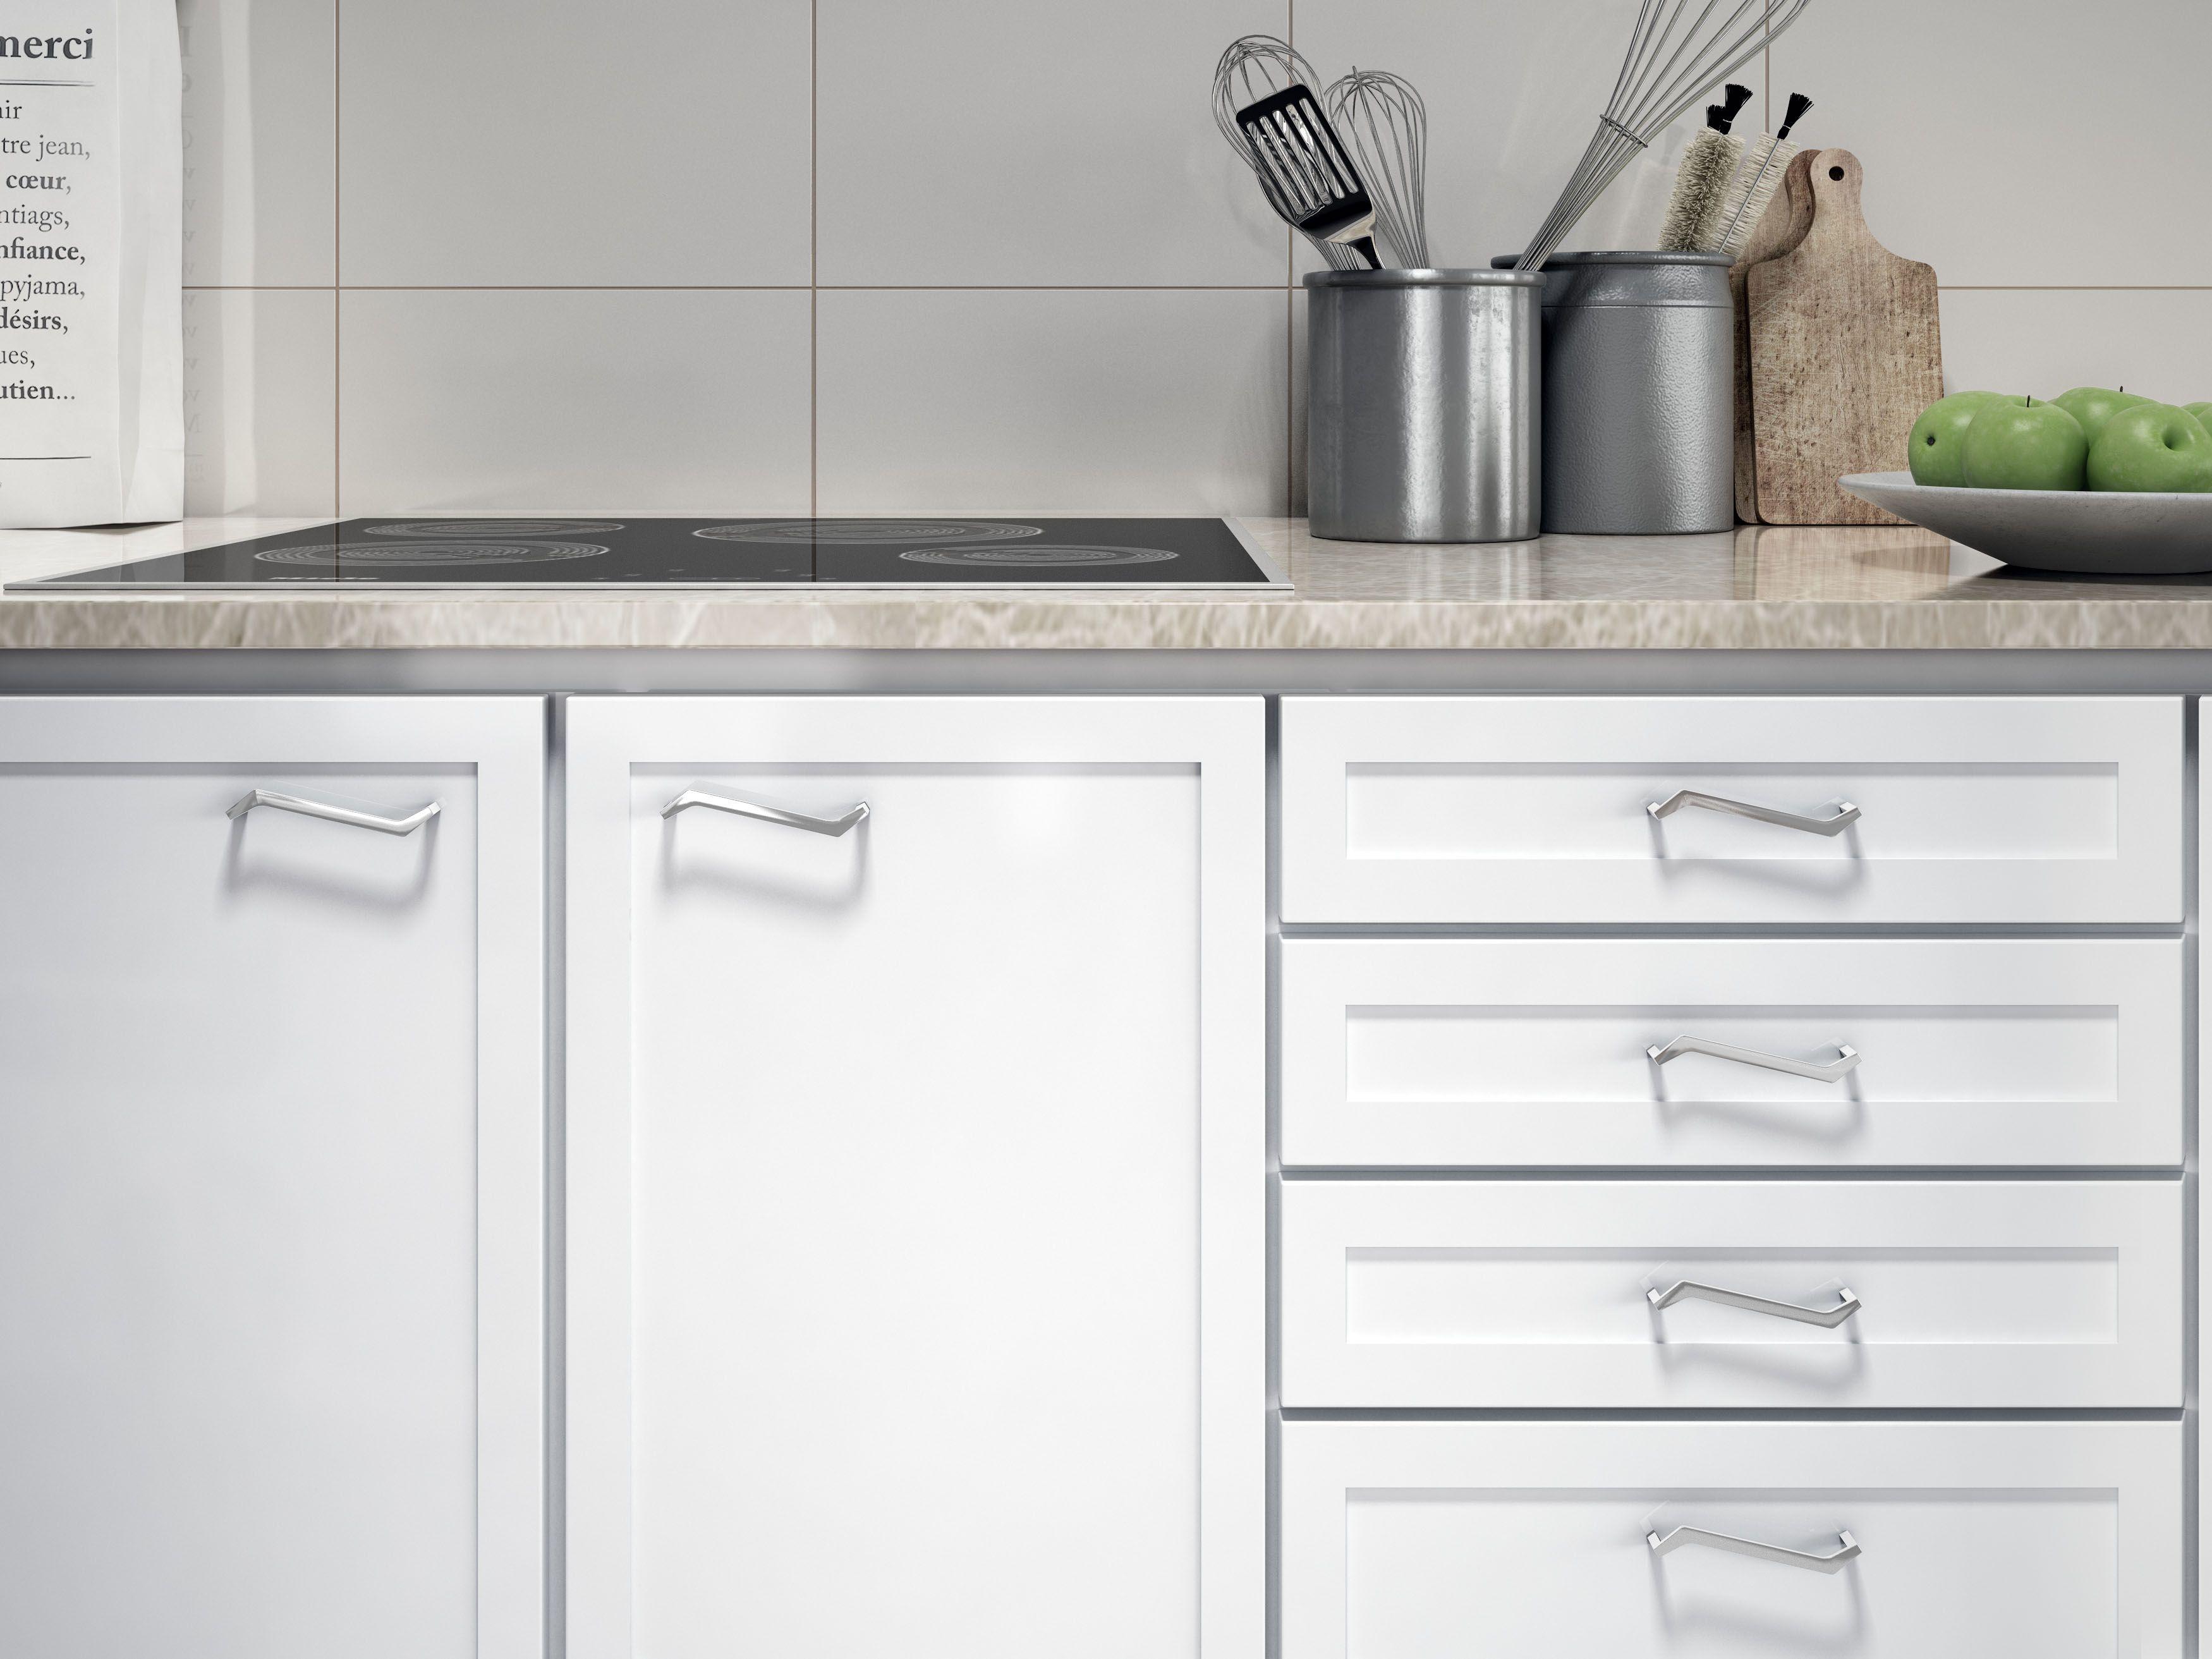 Se Trata De In Tirador Moderno En Cromo Brillo Sobre Un Mueble  # Budnik Muebles De Cocina